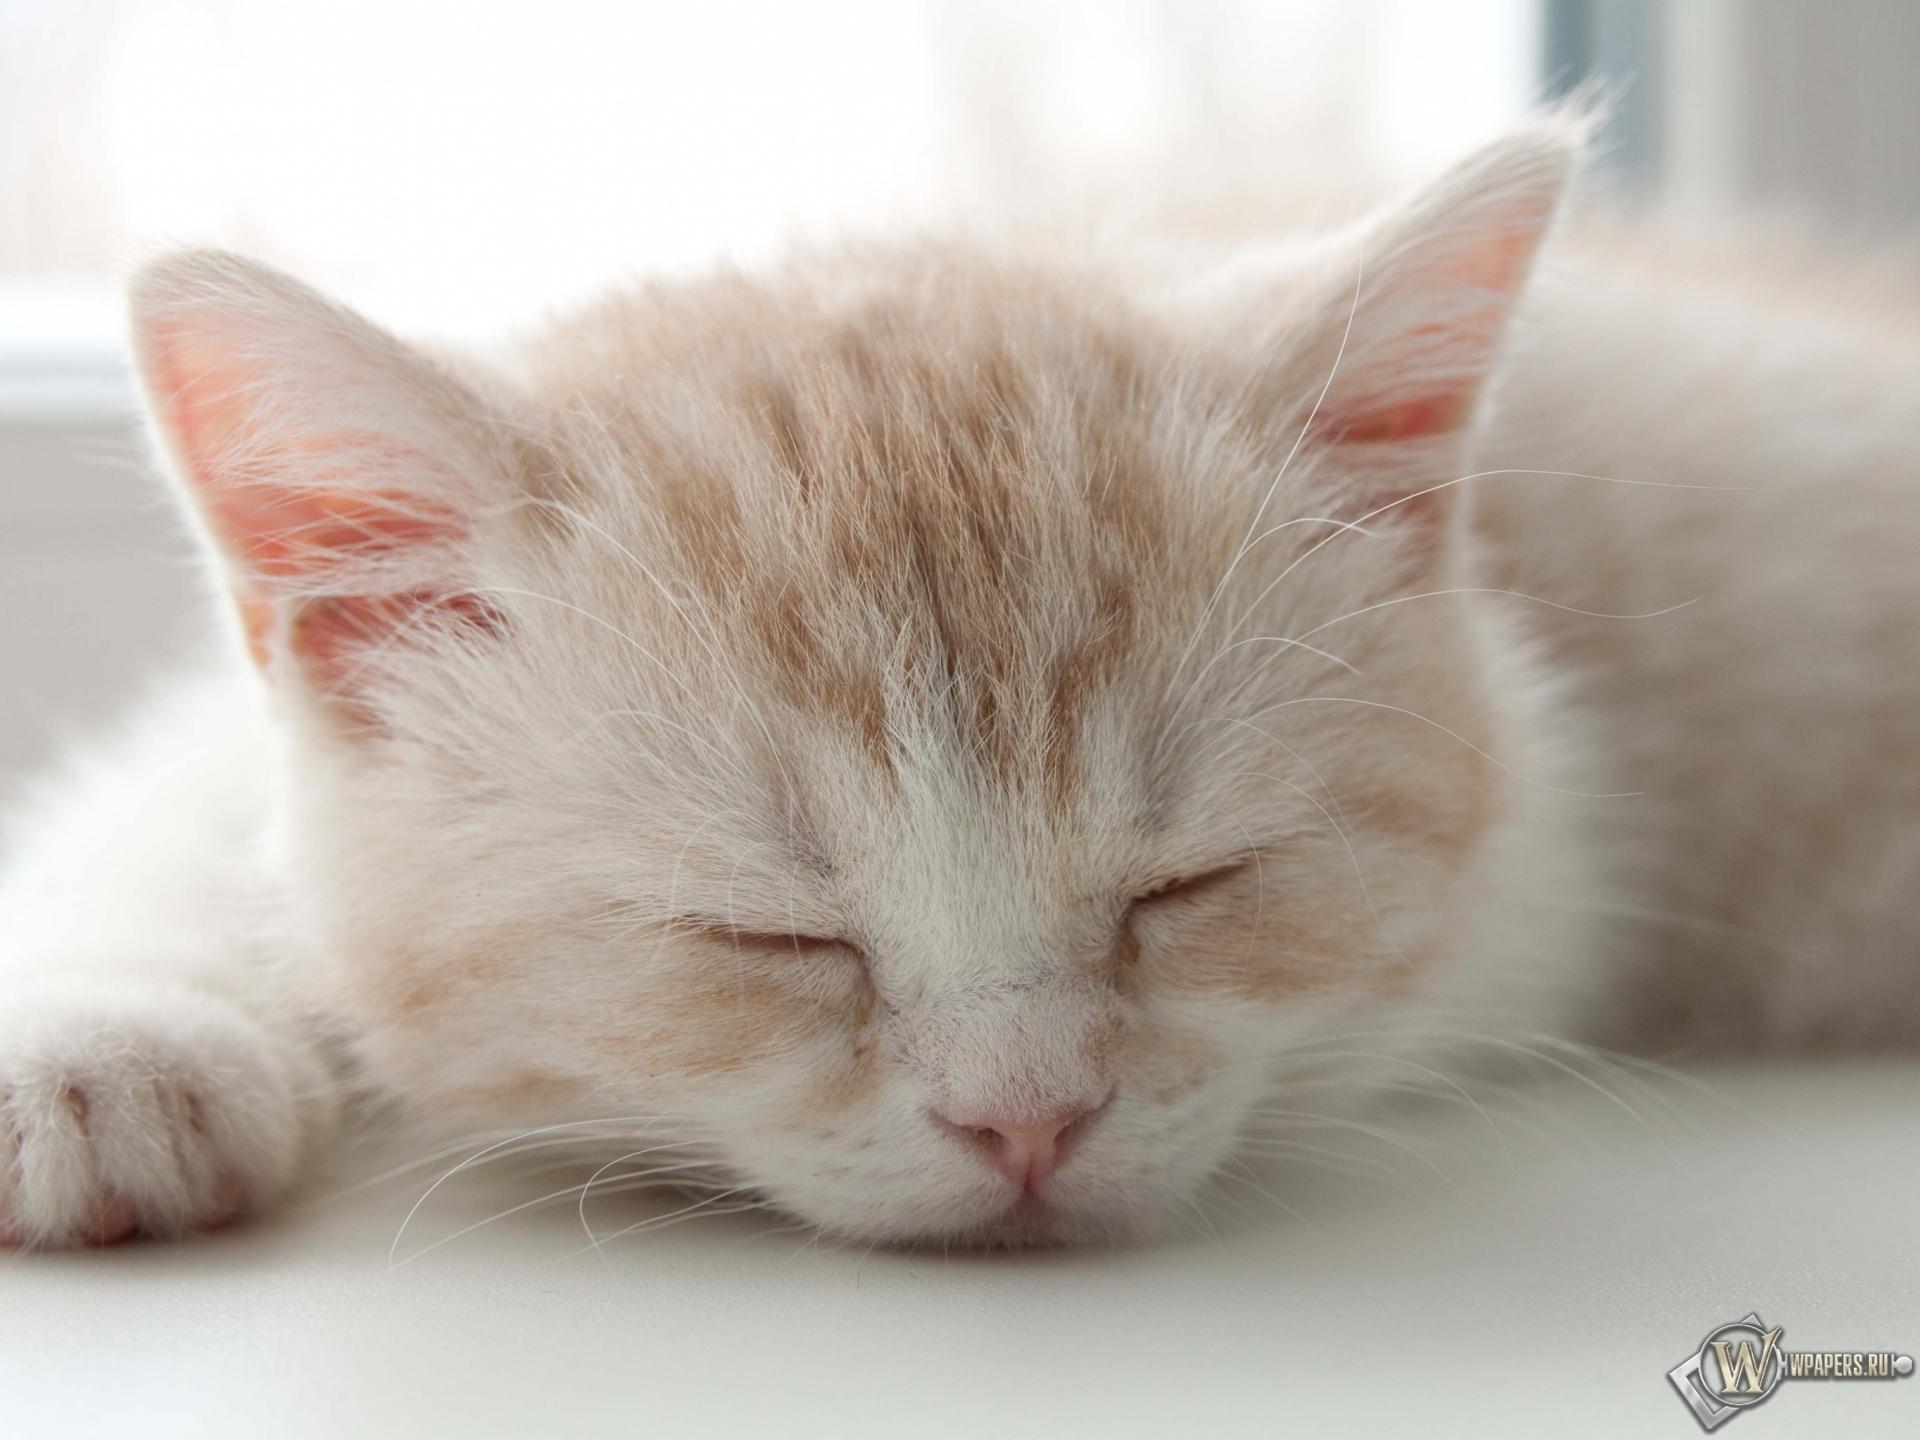 Котёнок спит 1920x1440